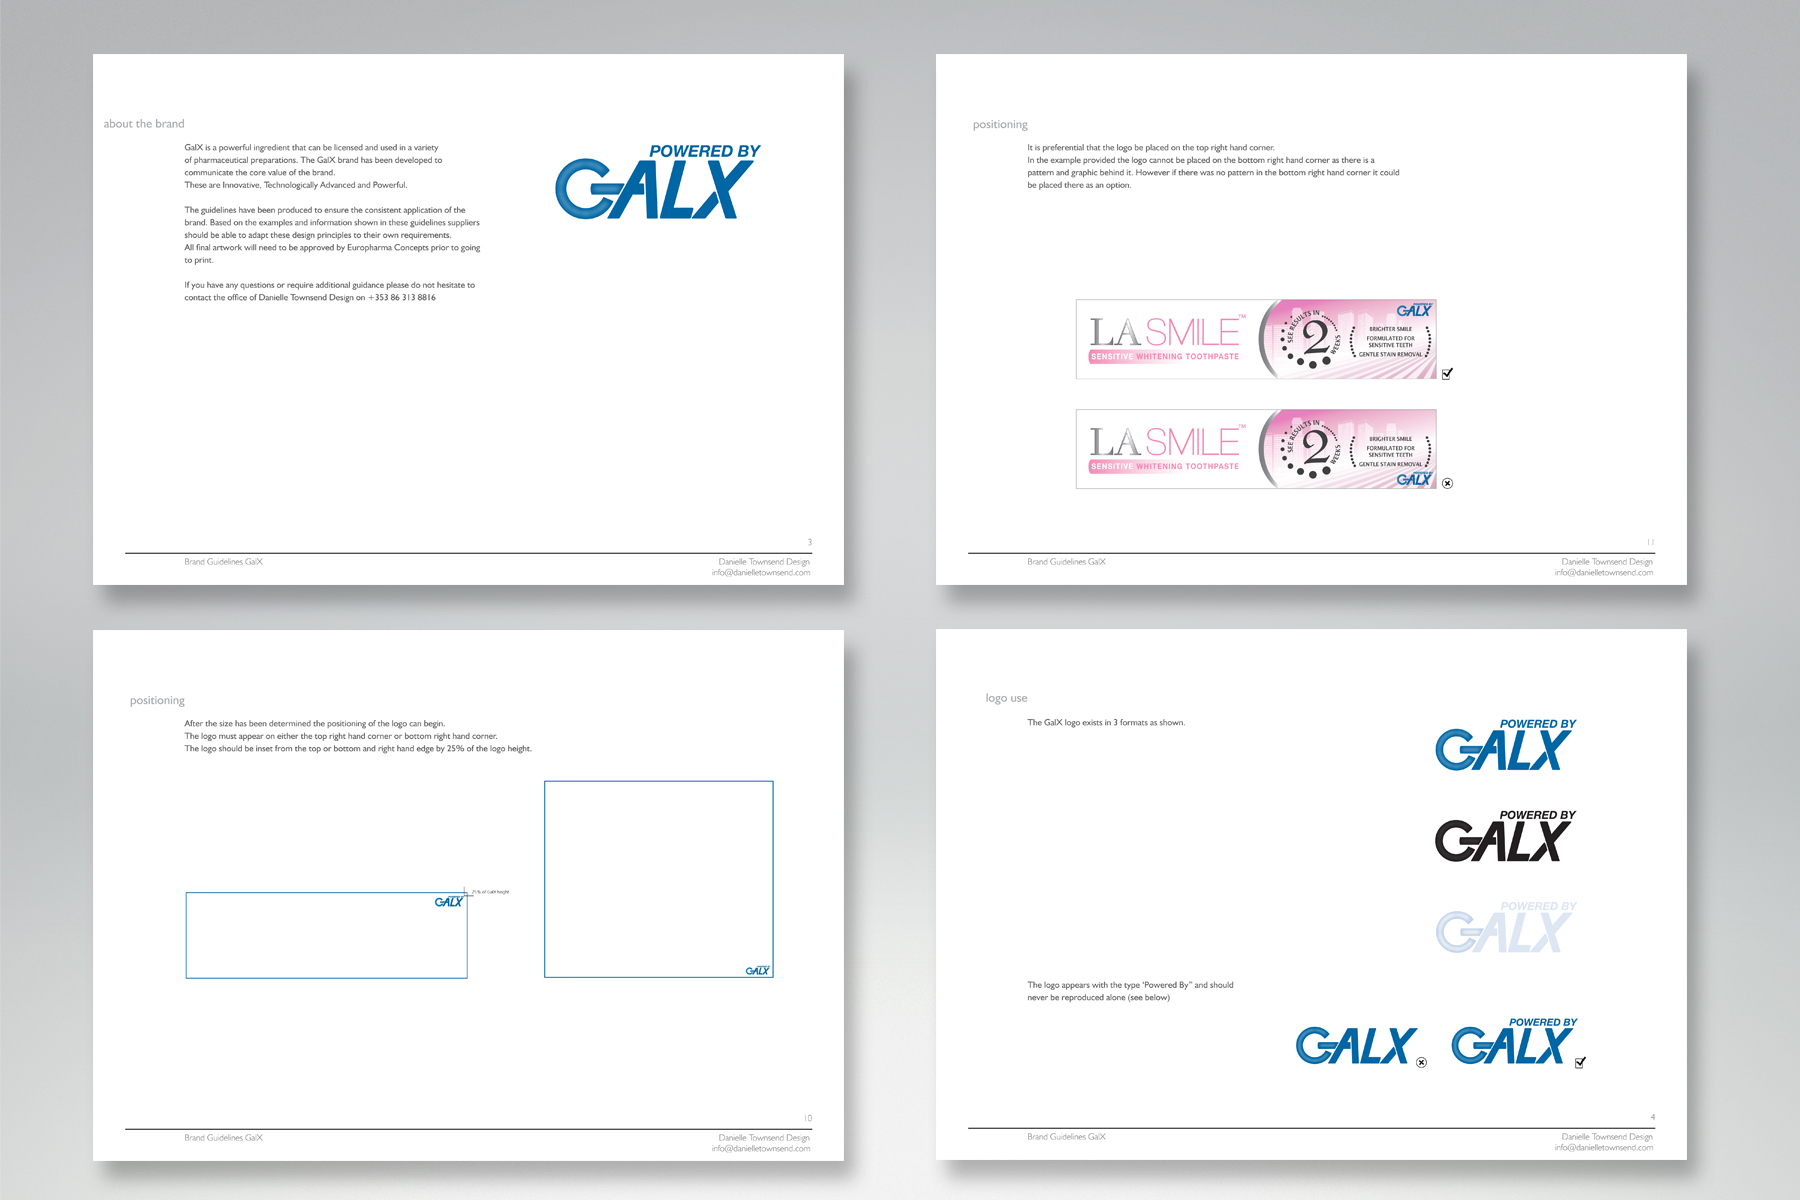 Galx-brand-guidelines2.jpg